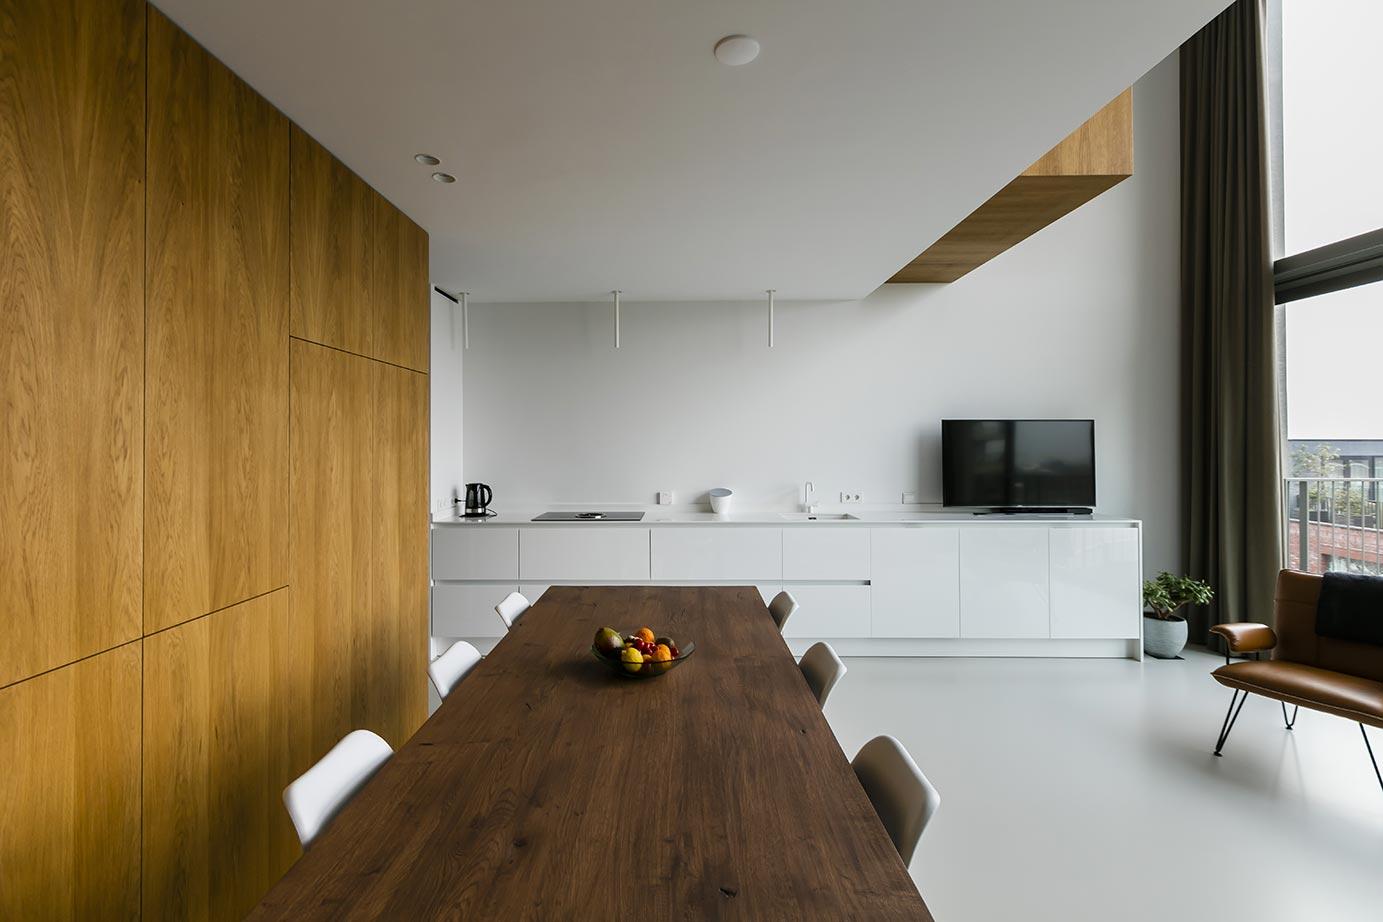 Greeploze Design Keukens : Greeploos design keuken kopen in amsterdam bekijk foto s keur